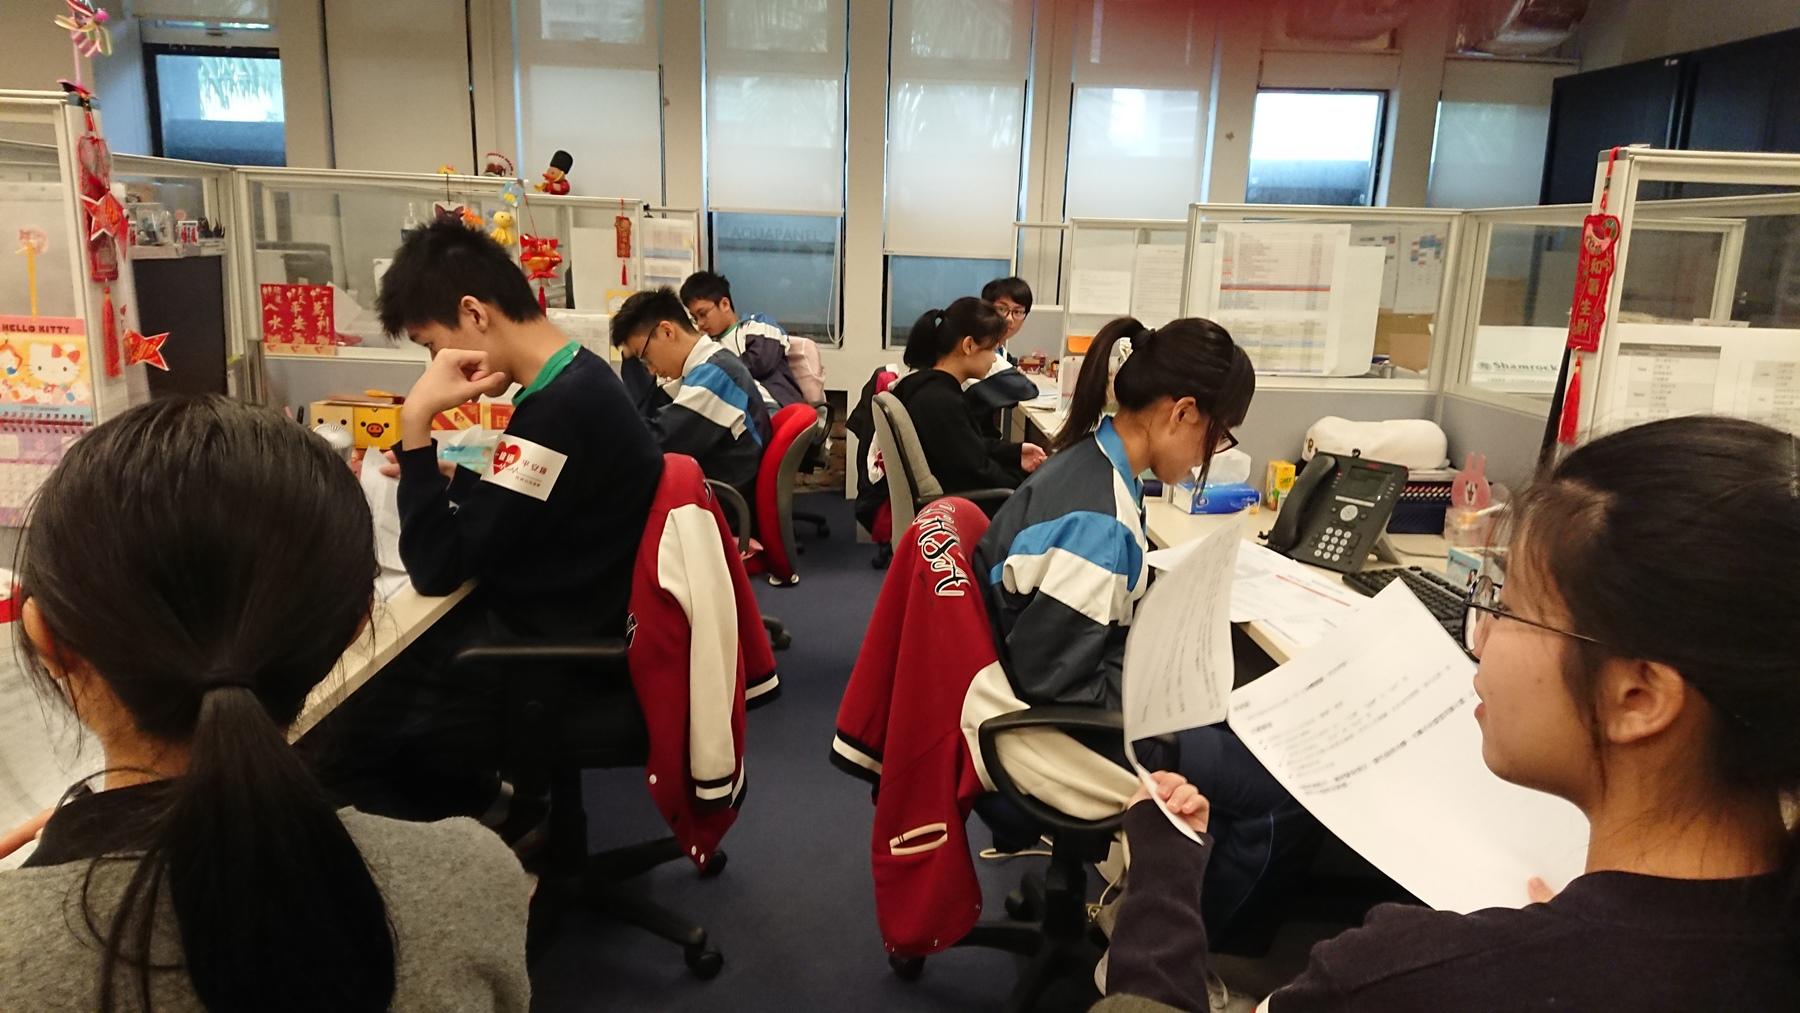 http://npc.edu.hk/sites/default/files/dsc_2628.jpg